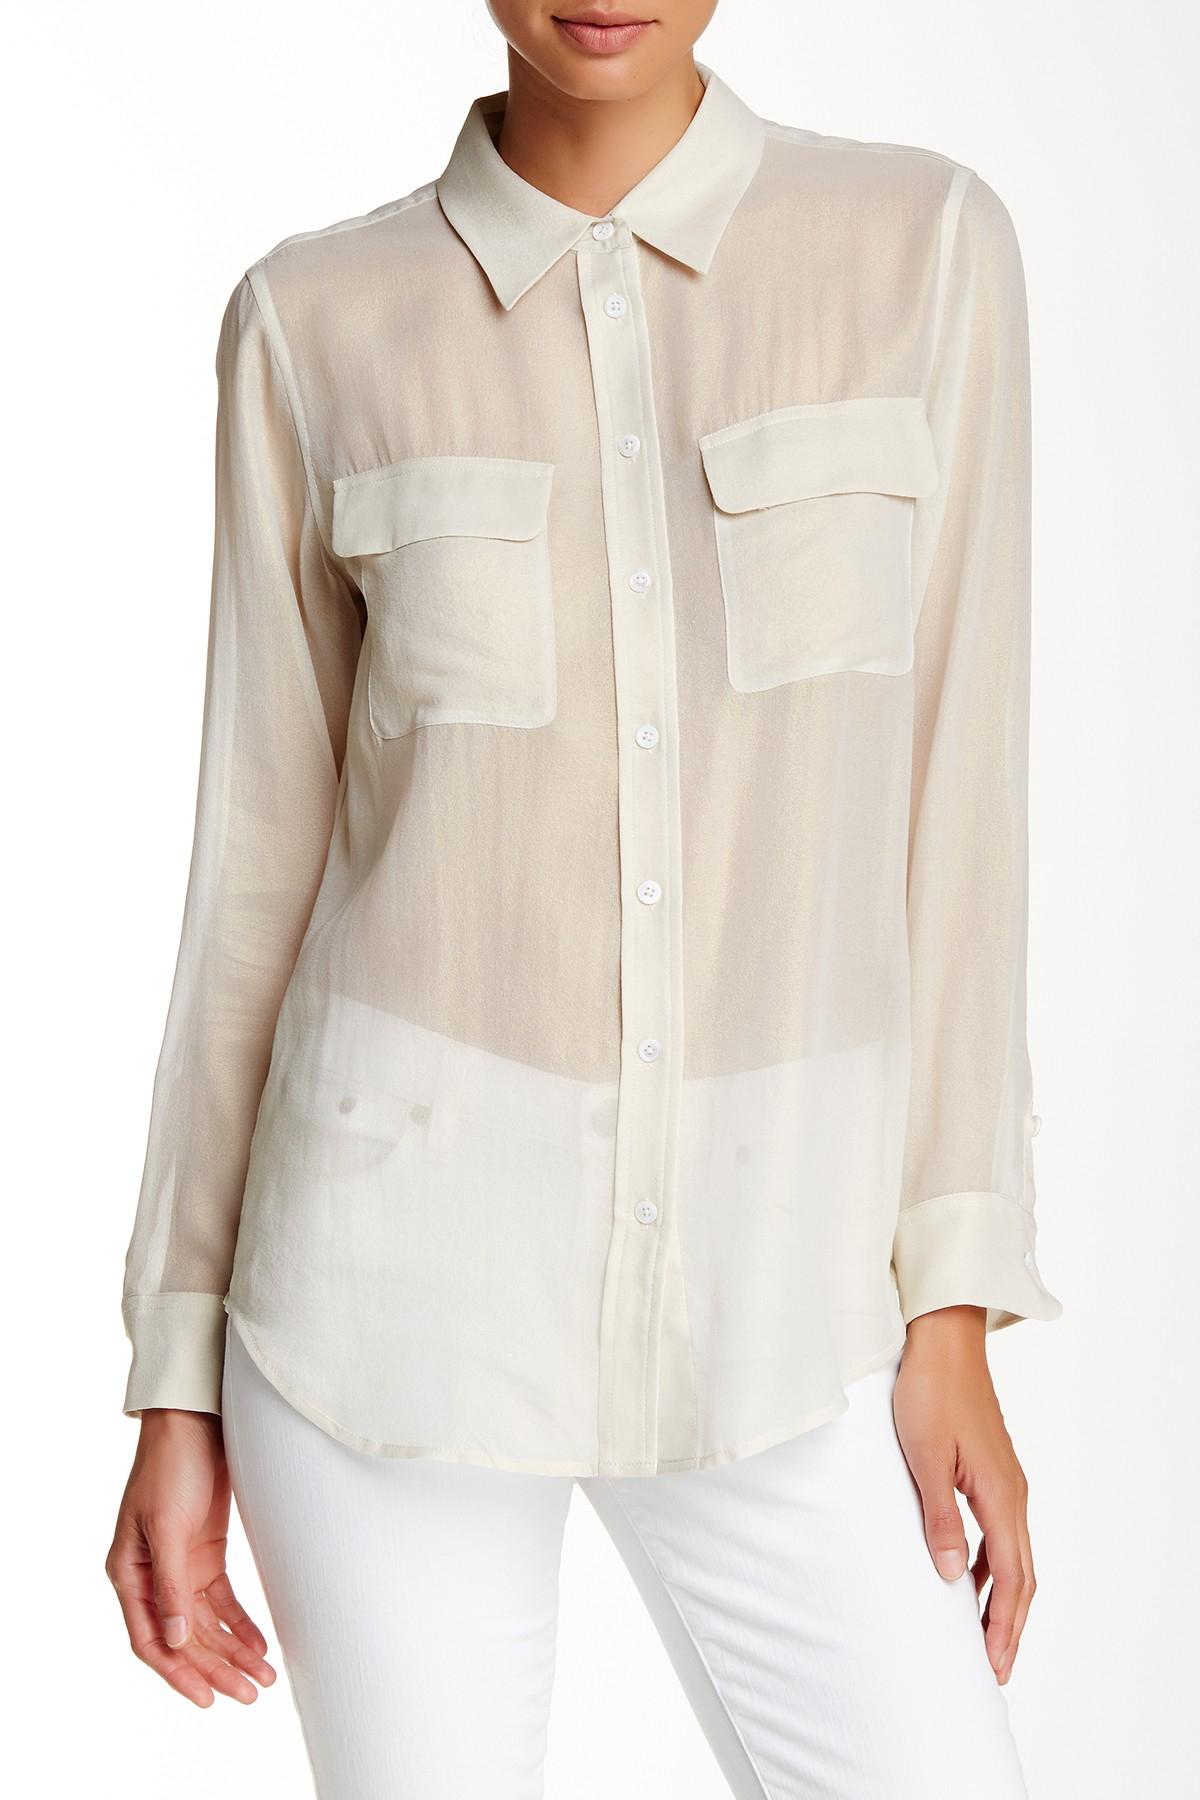 Equipment slim signature sheer silk shirt in multicolor for Equipment signature silk shirt